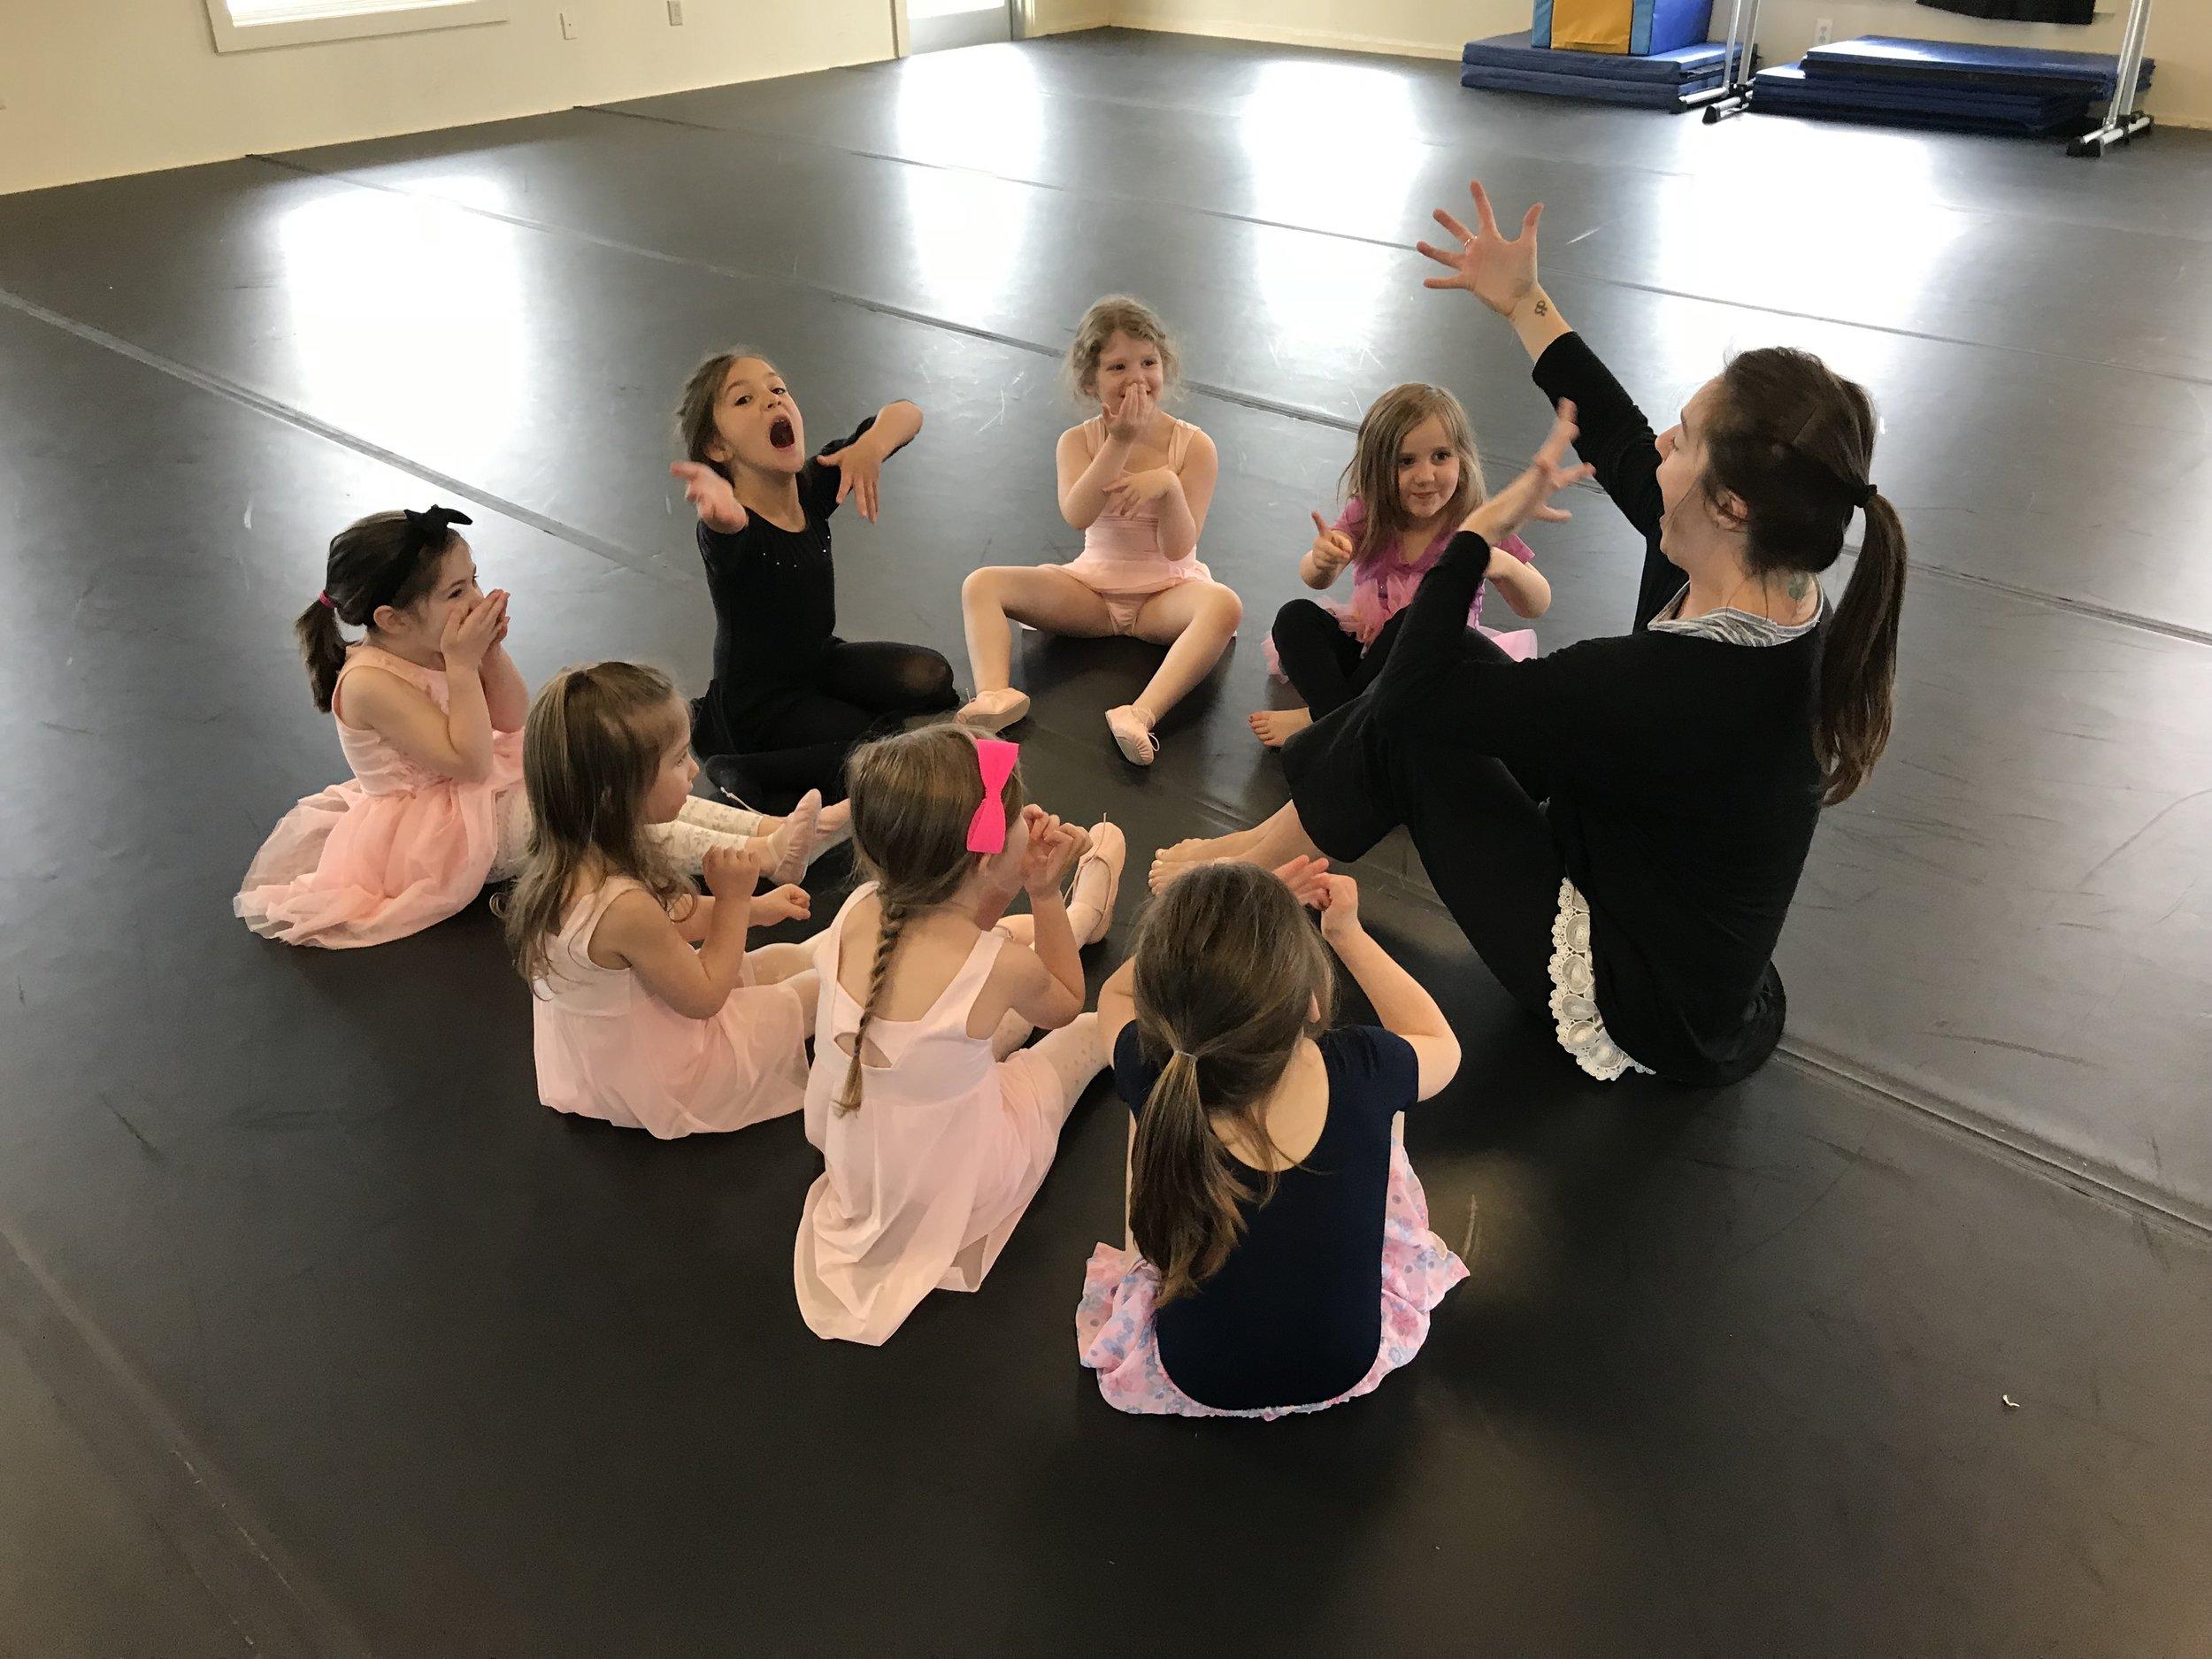 CREATIVE BALLET ARTS  ages 4 - 6  TUES 3:45 - 4:30 pm